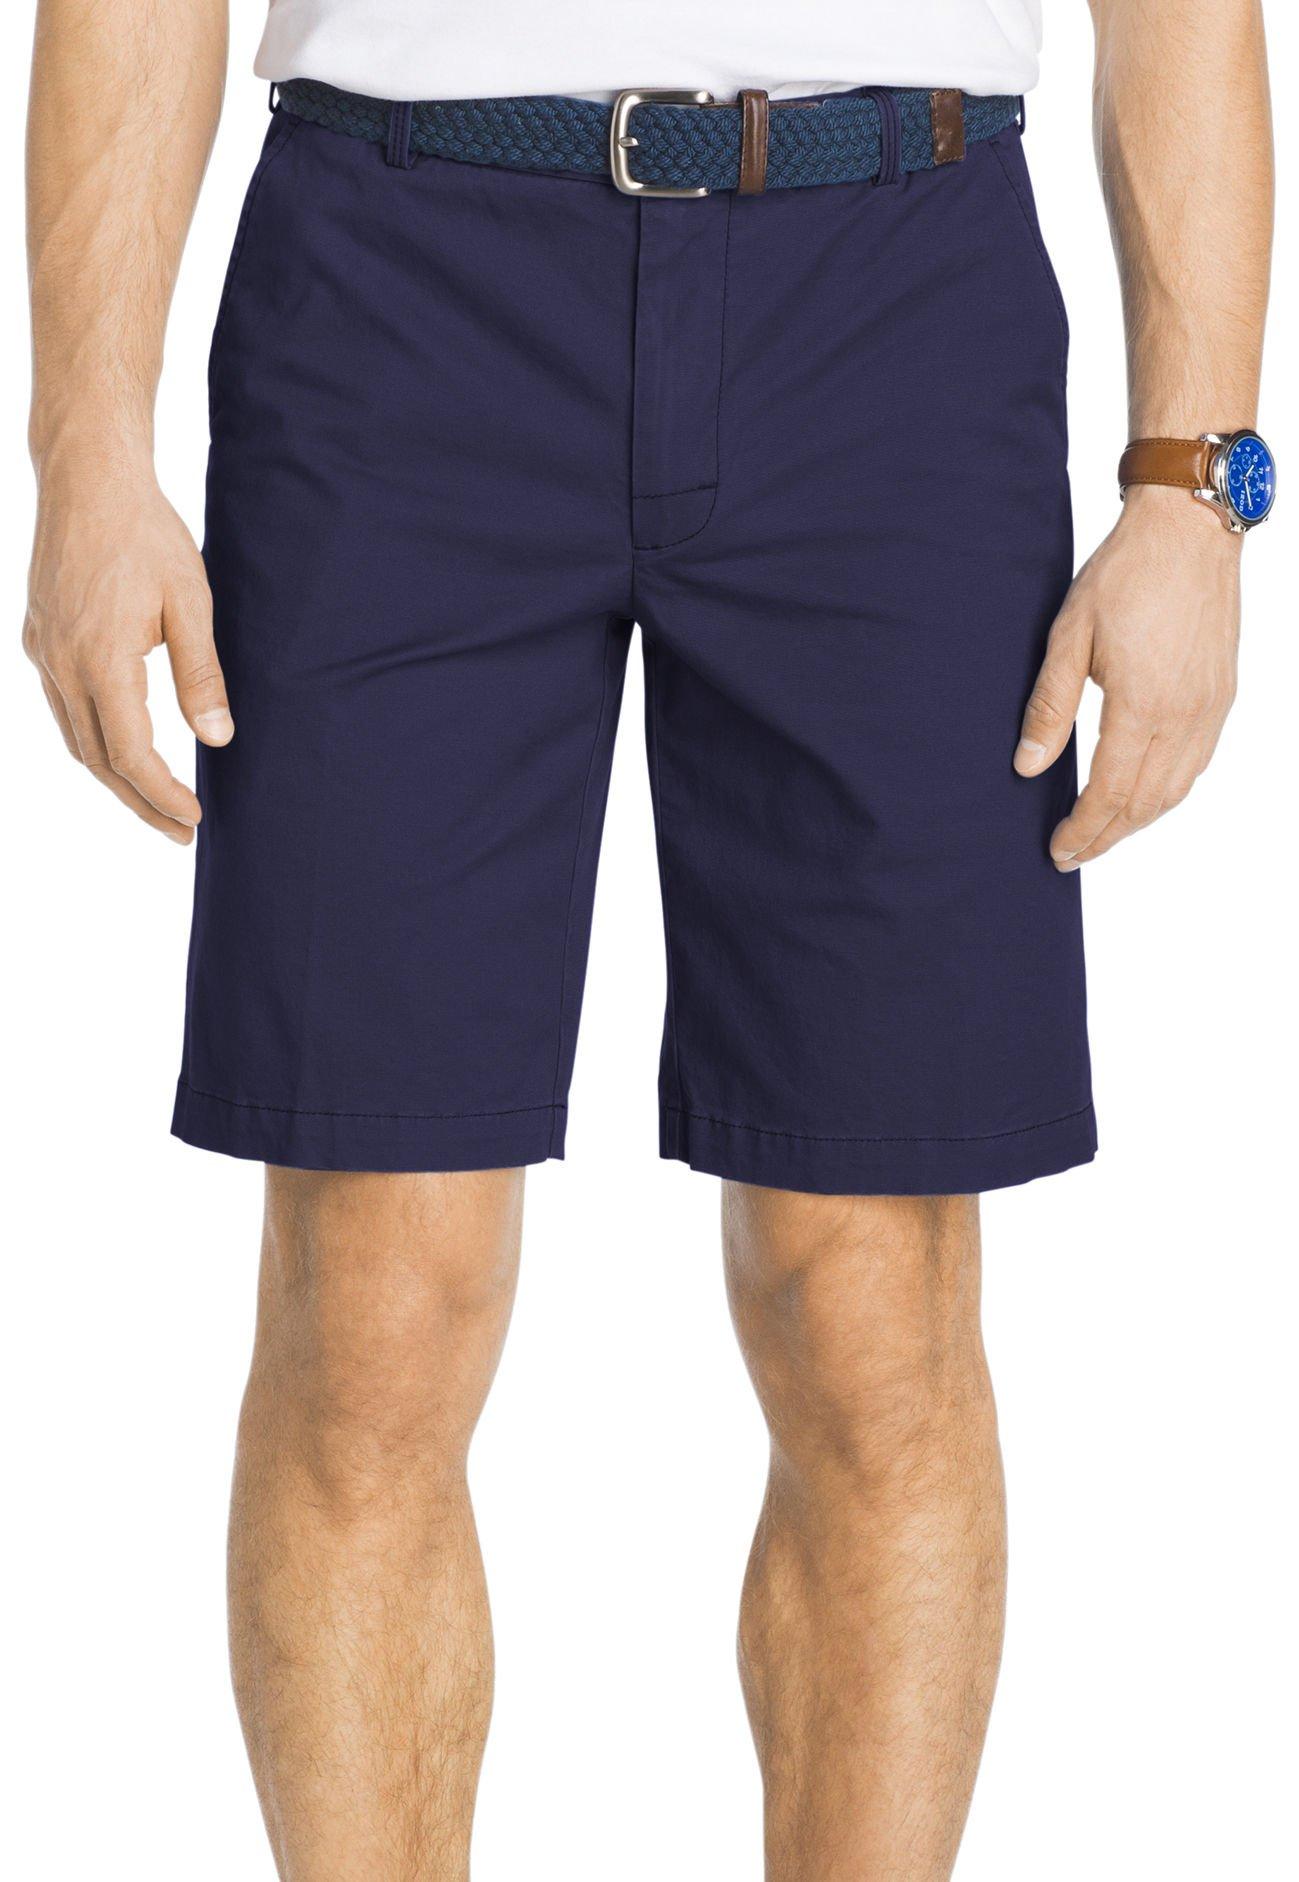 IZOD Men's Saltwater Flat Front Shorts, Cadet Navy, 32